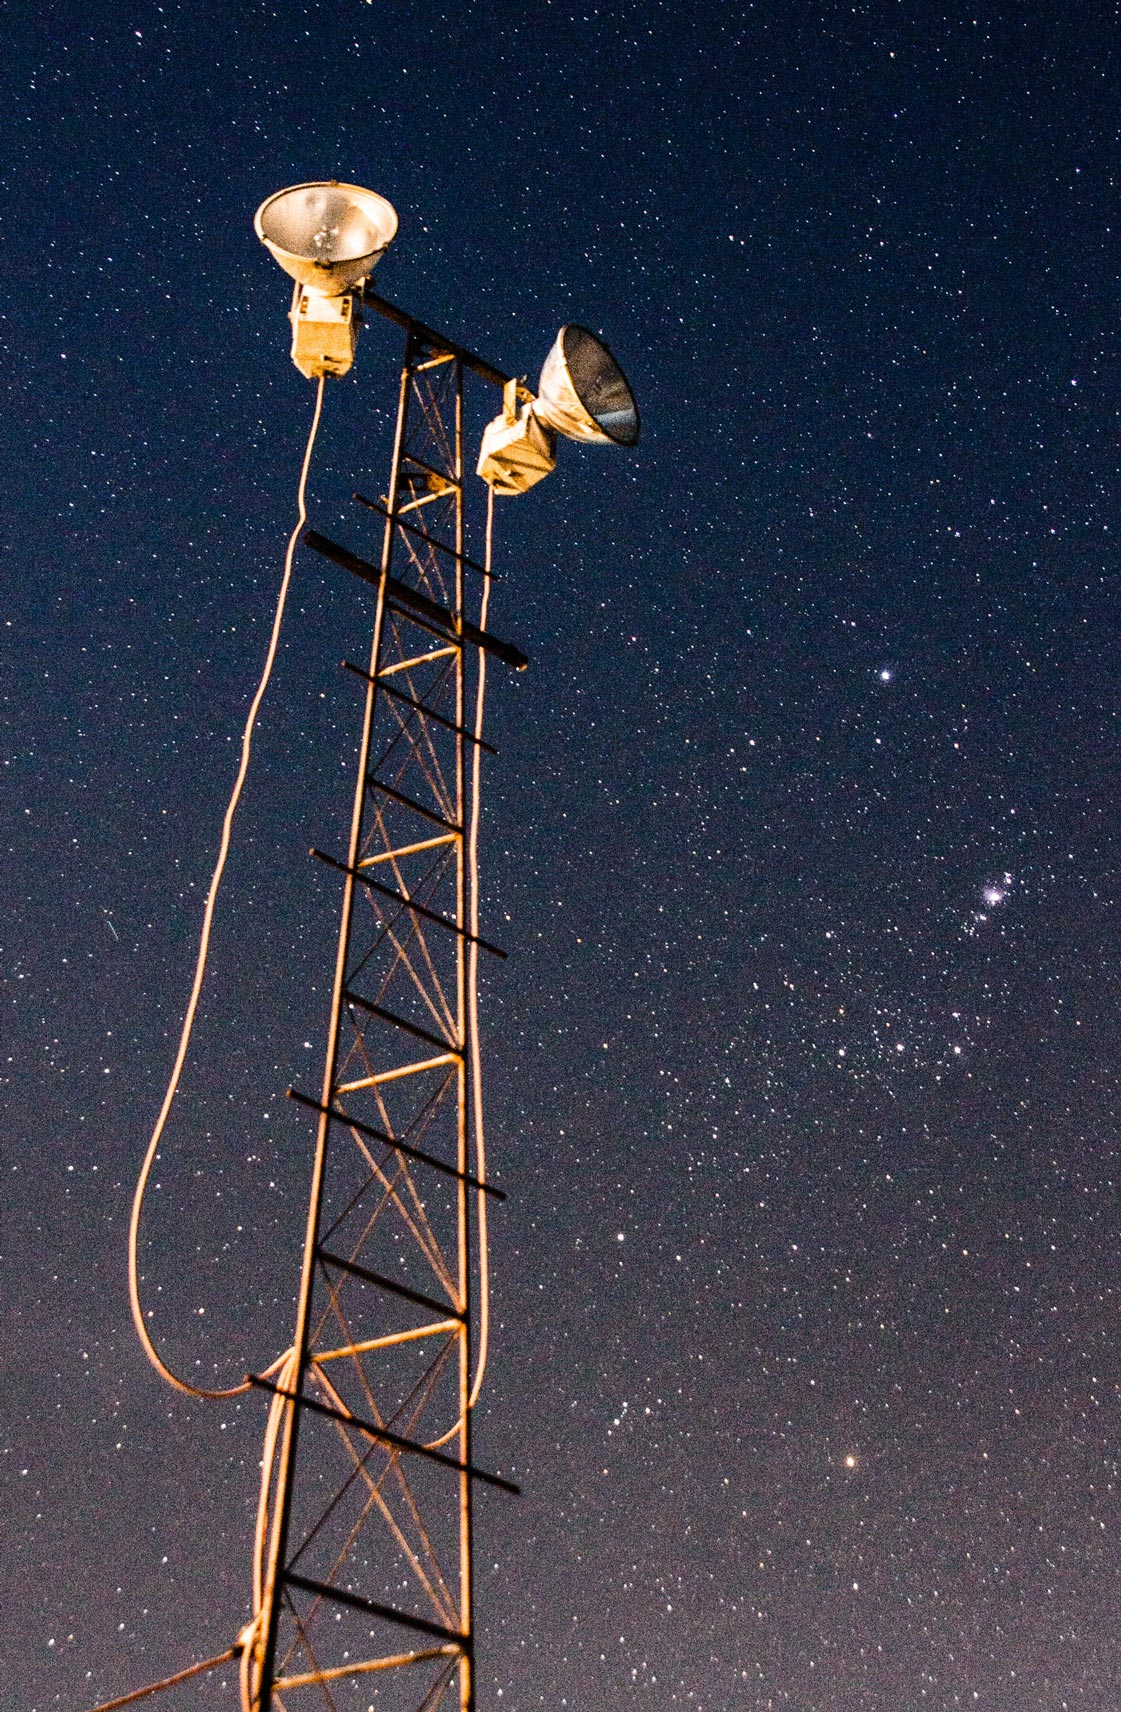 Paesaggi-Australia - DSC 0544 - Fotografo di Paesaggi Australia fotografia notturna - Fotografo di Paesaggi Australia fotografia notturna